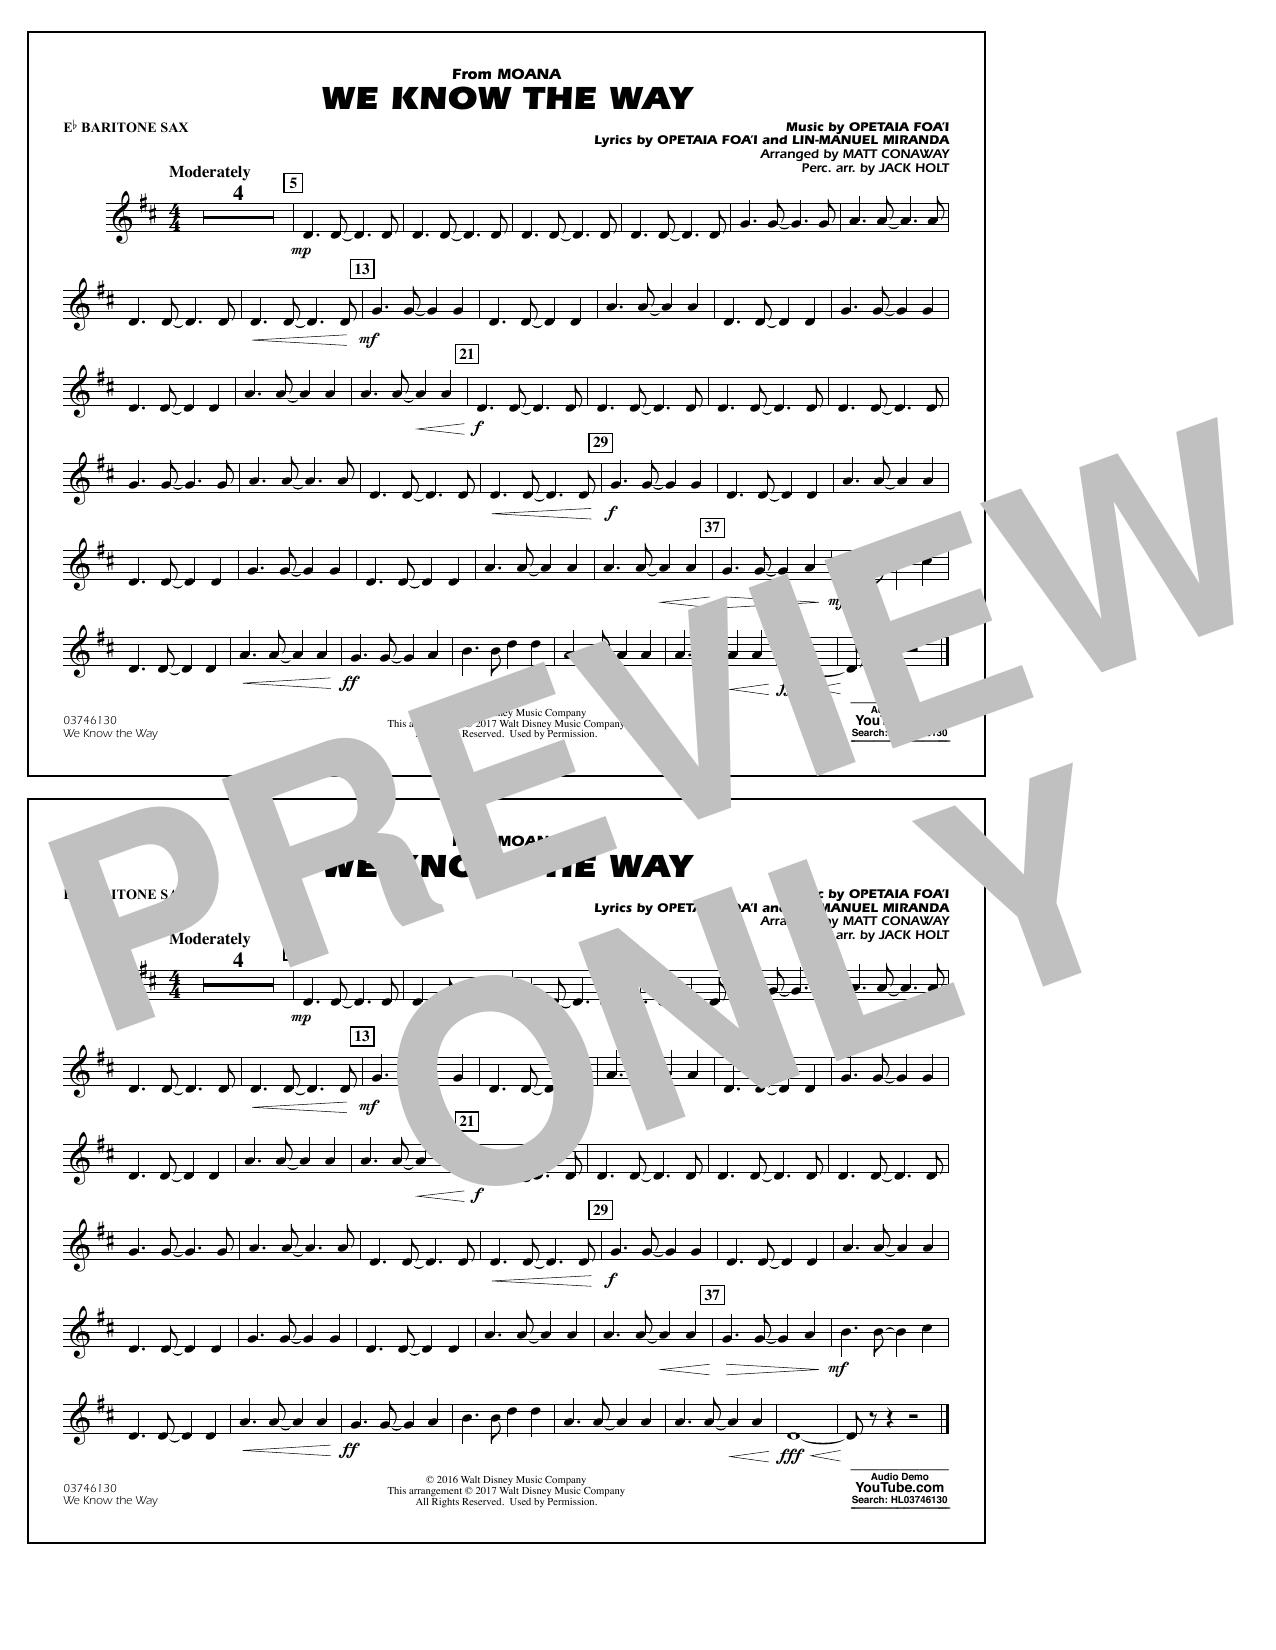 We Know the Way (from Moana) - Eb Baritone Sax Sheet Music